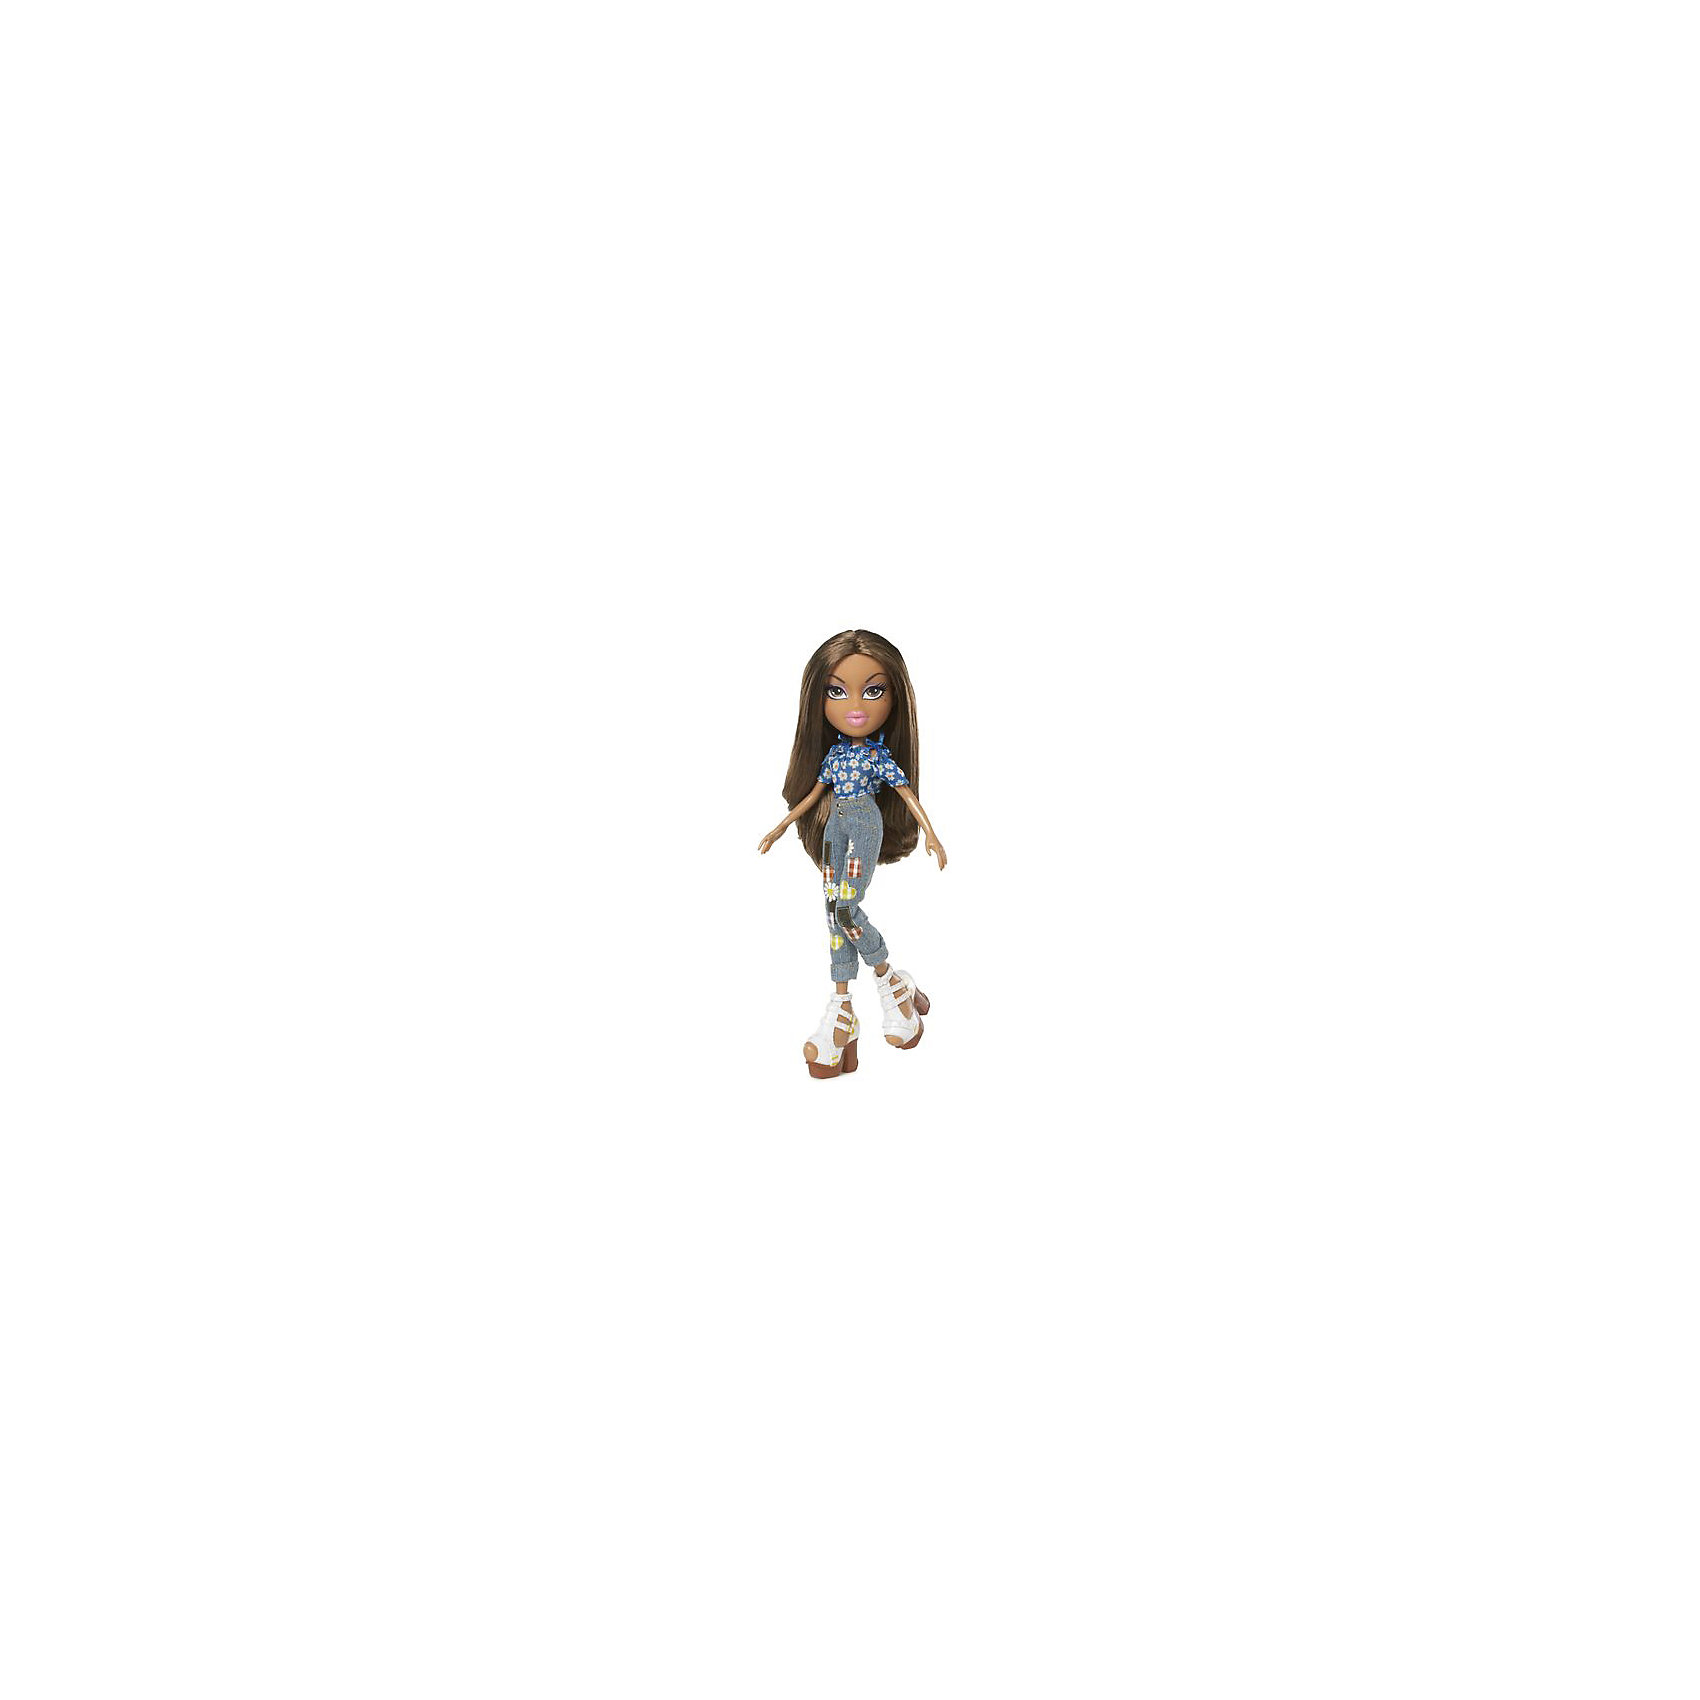 Кукла делюкс